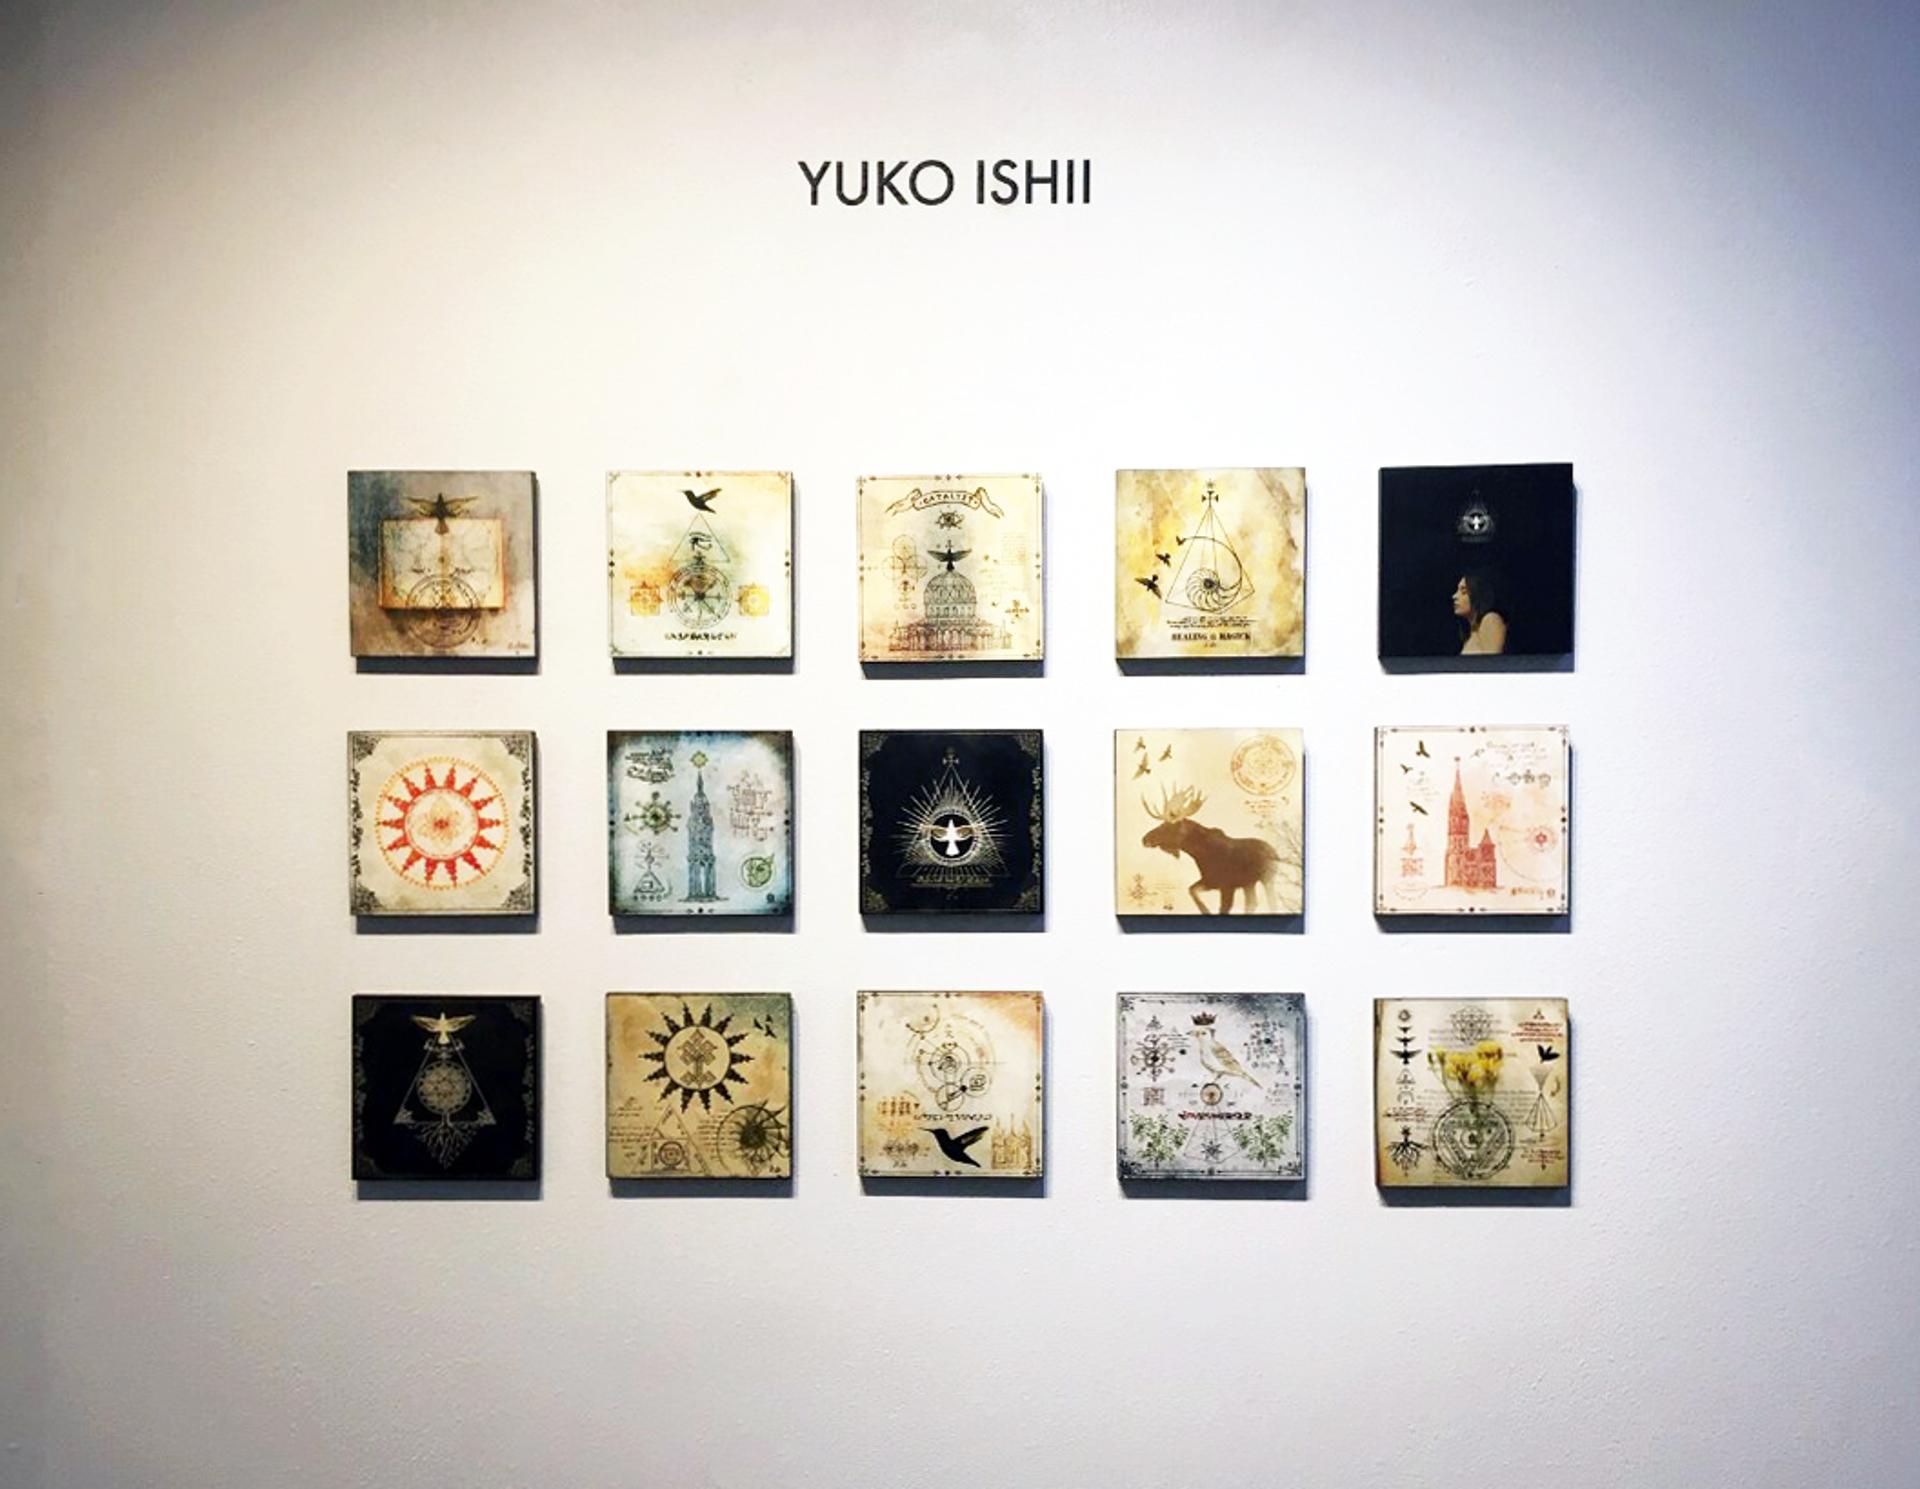 Catalyst (dreams come true) by Yuko Ishii